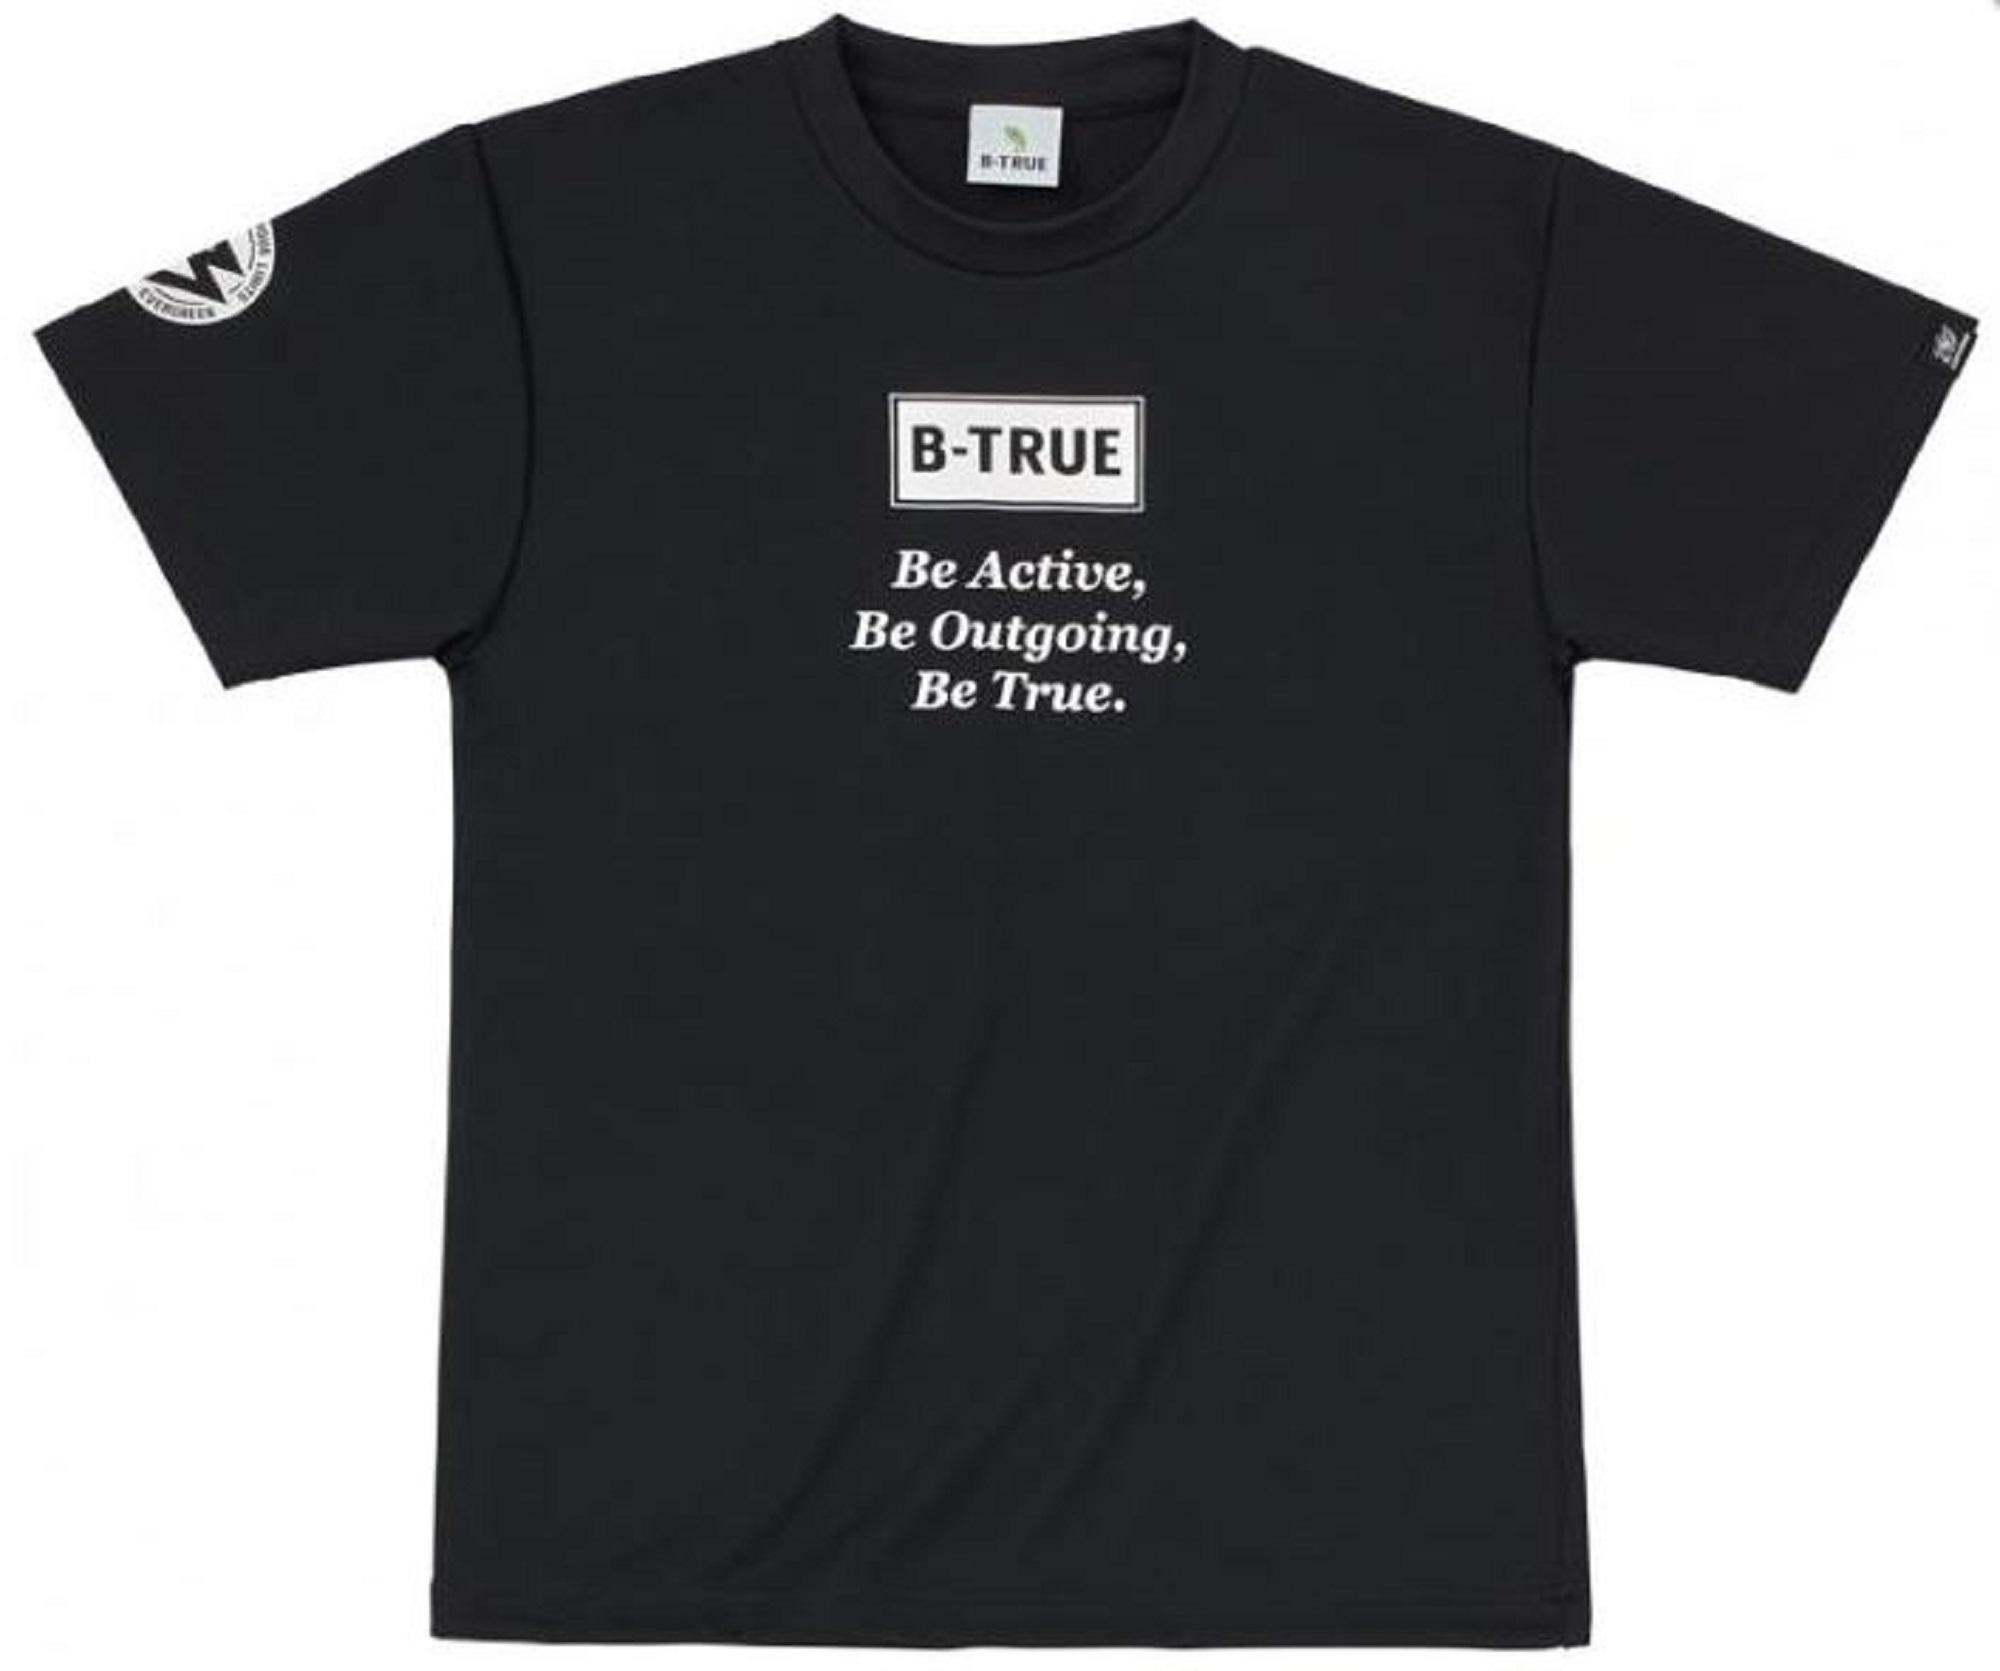 Evergreen T-Shirt Dry Fit Short Sleeve B-True D Type Size XXL Black (4913)